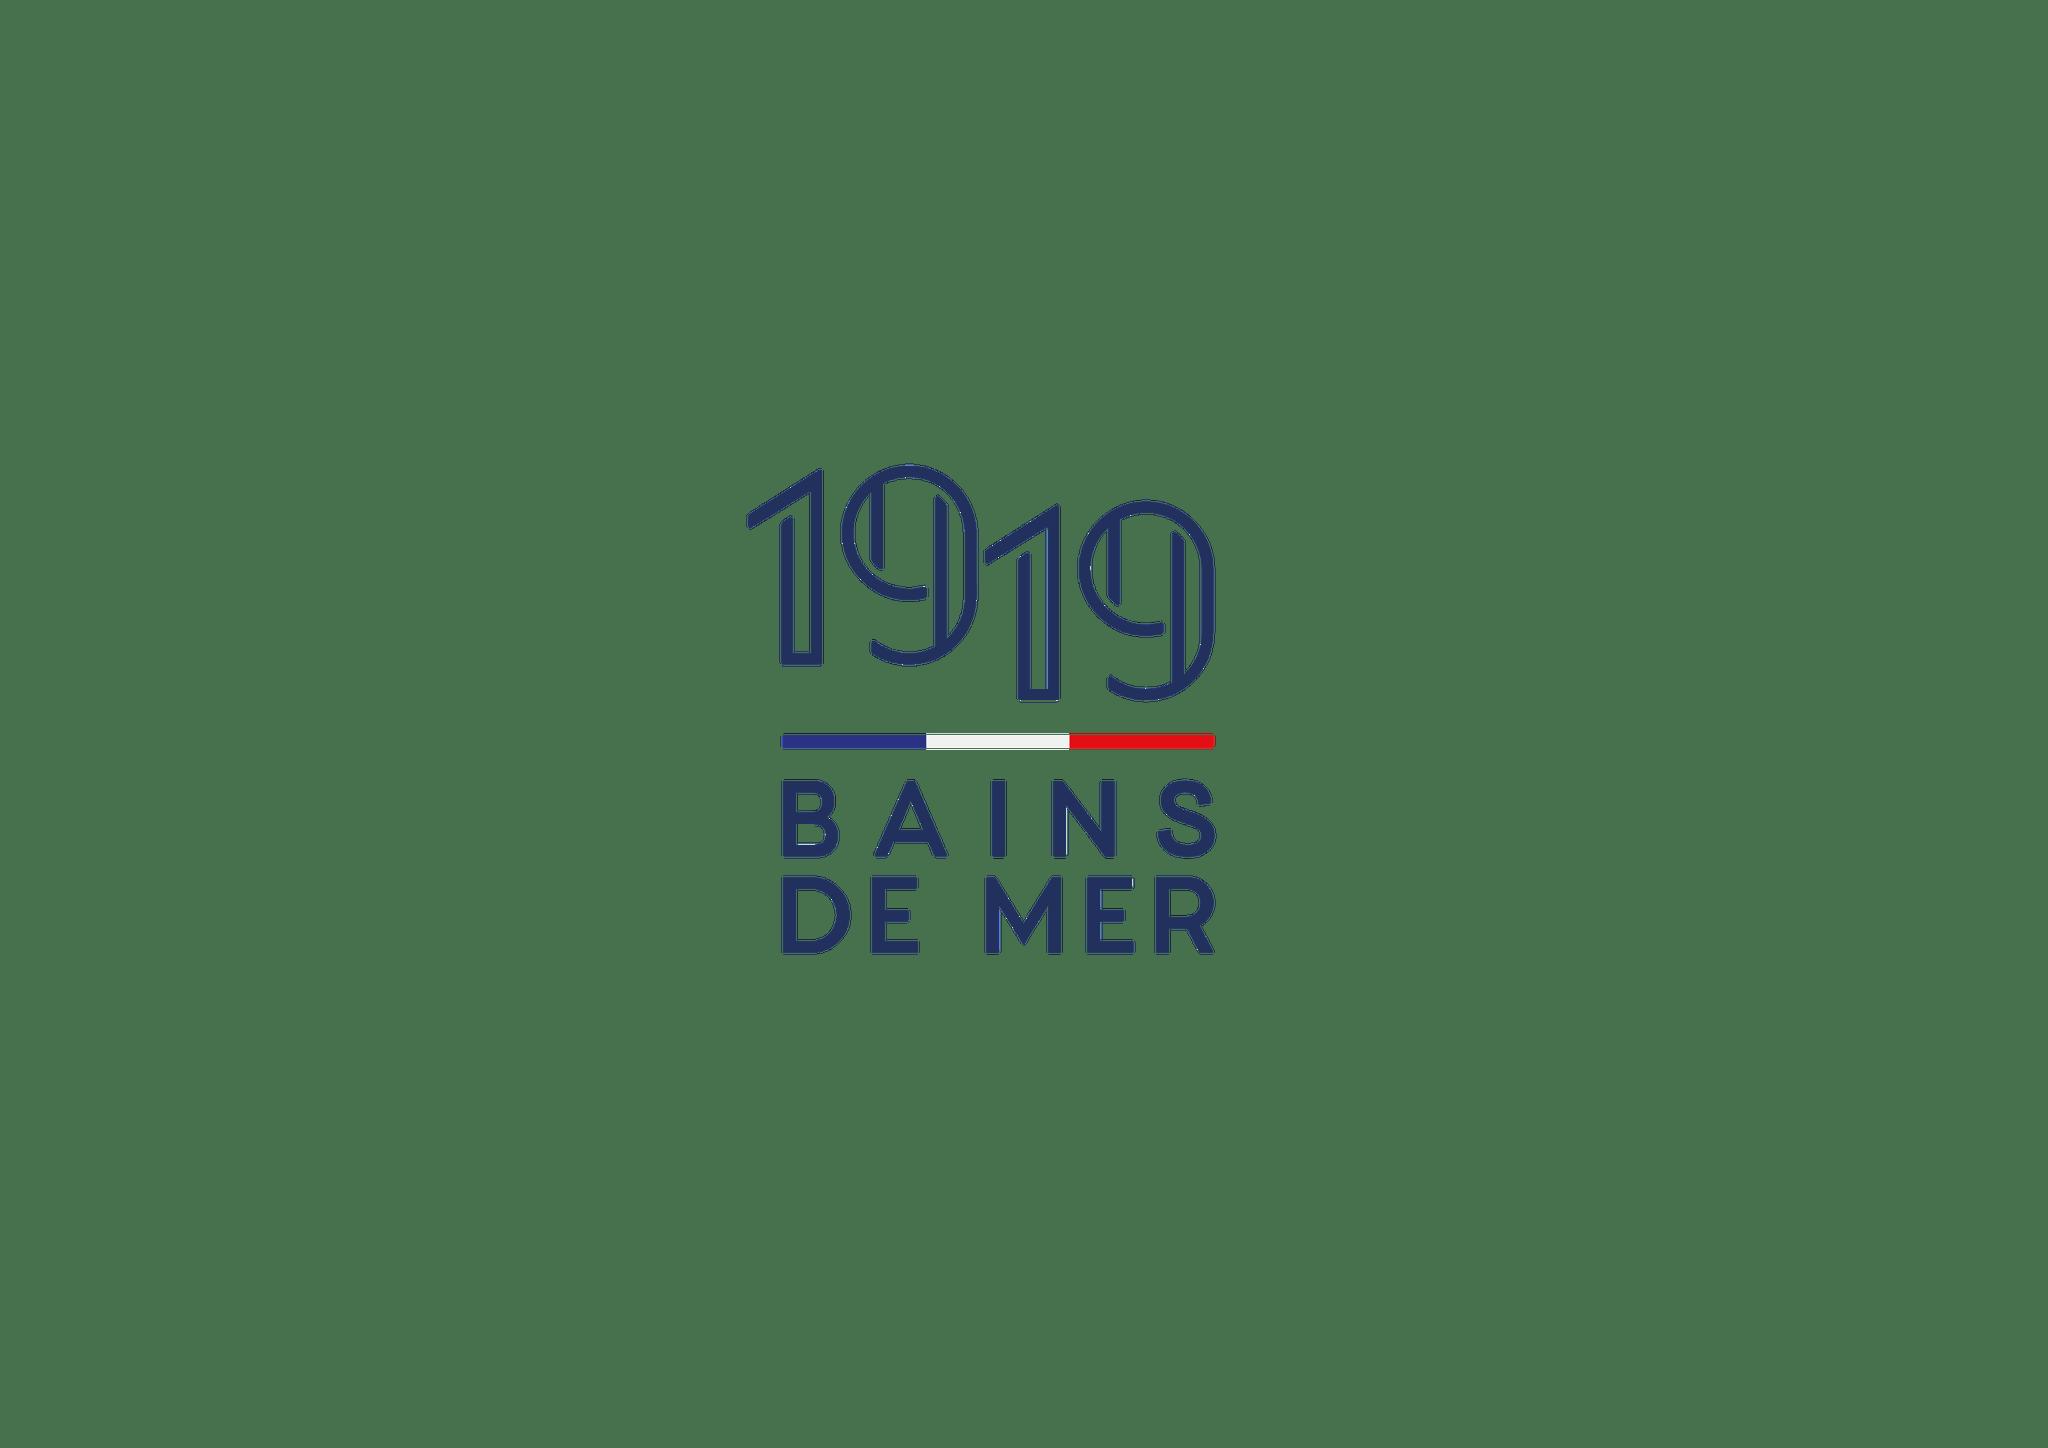 1919 Bains de mer